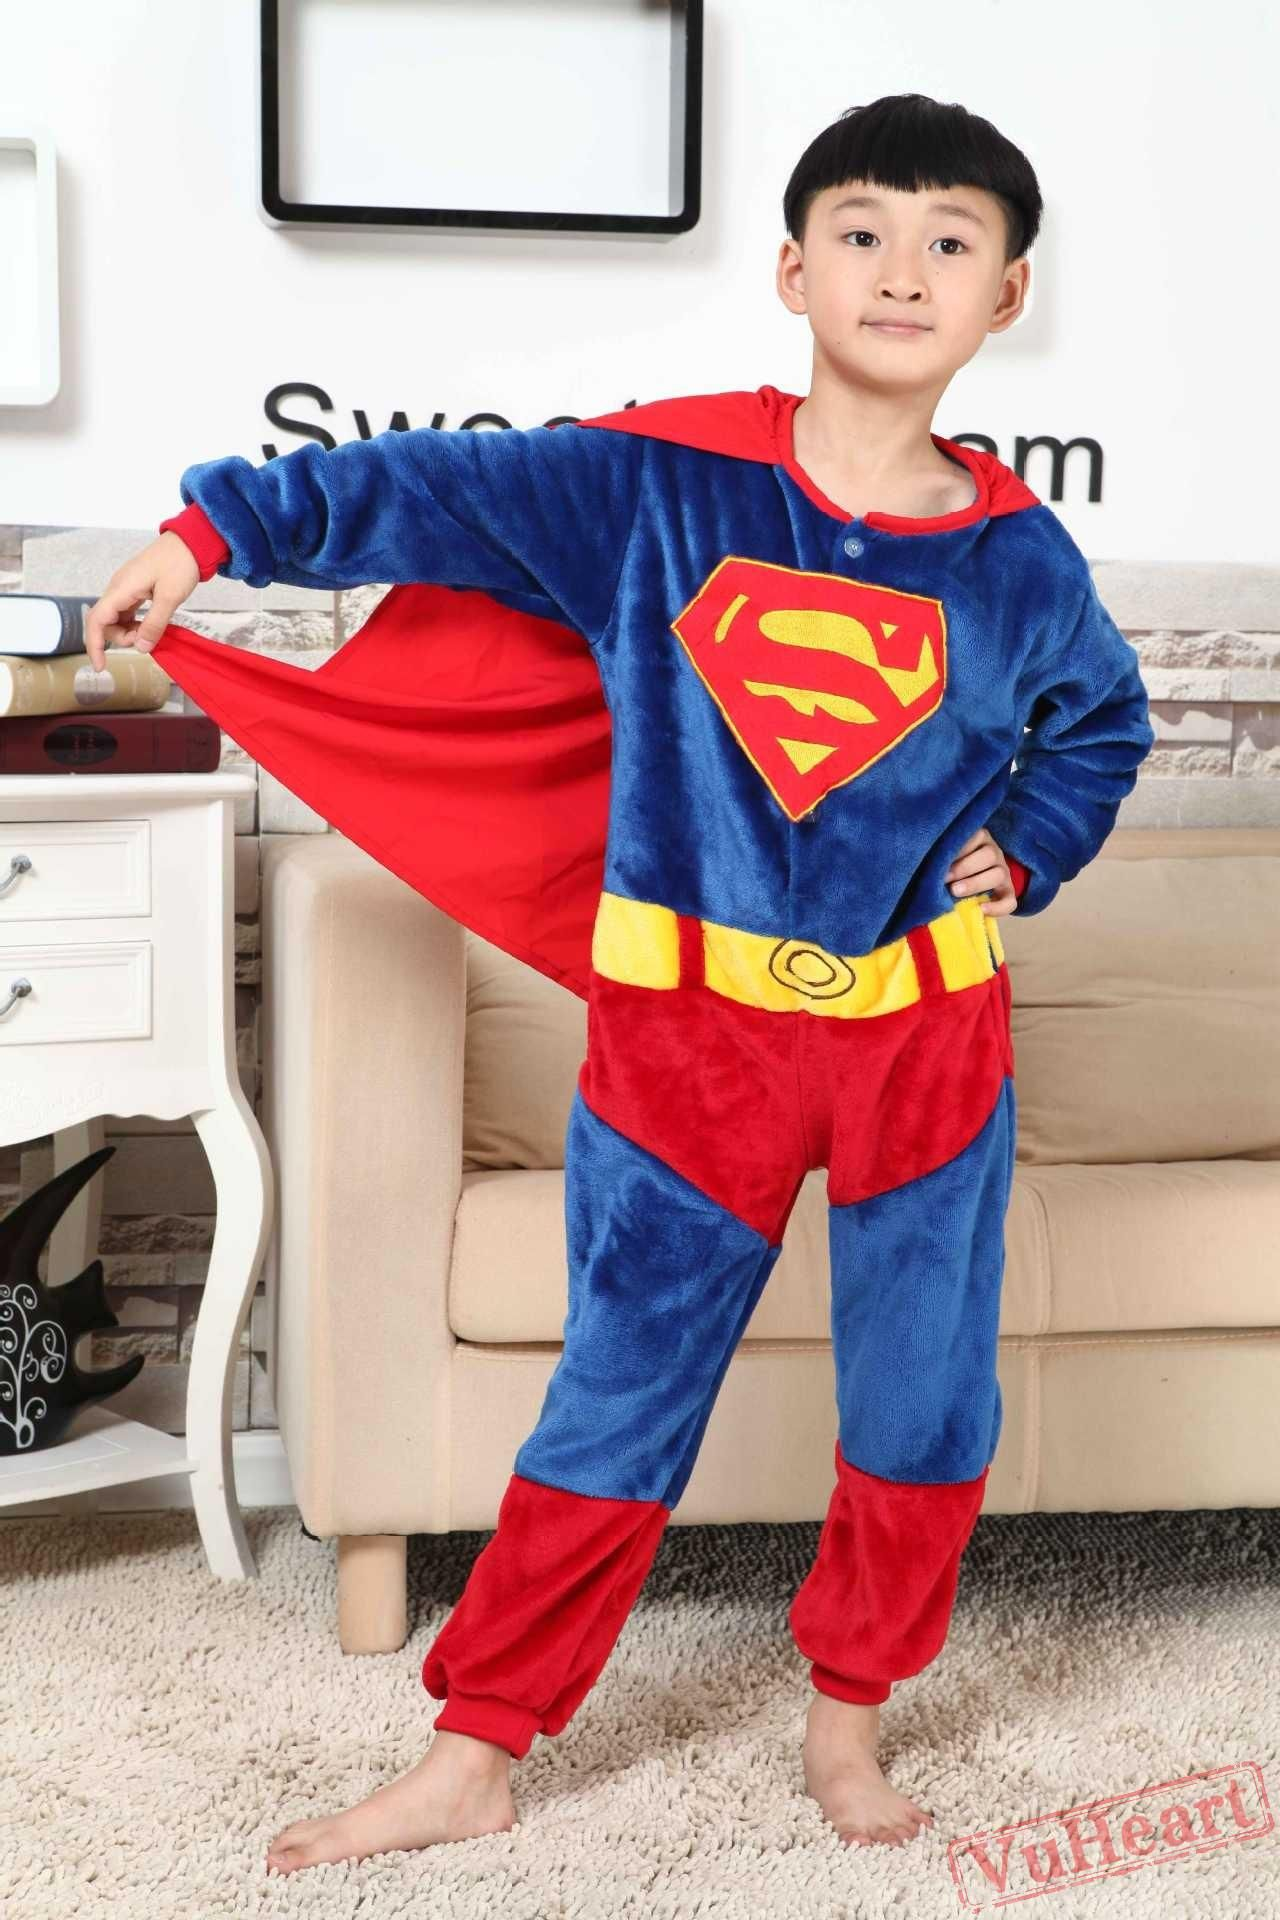 a7c5859f37 Super Hero Superman Kigurumi Onesies Pajamas Costumes for Boys   Girls  Halloween